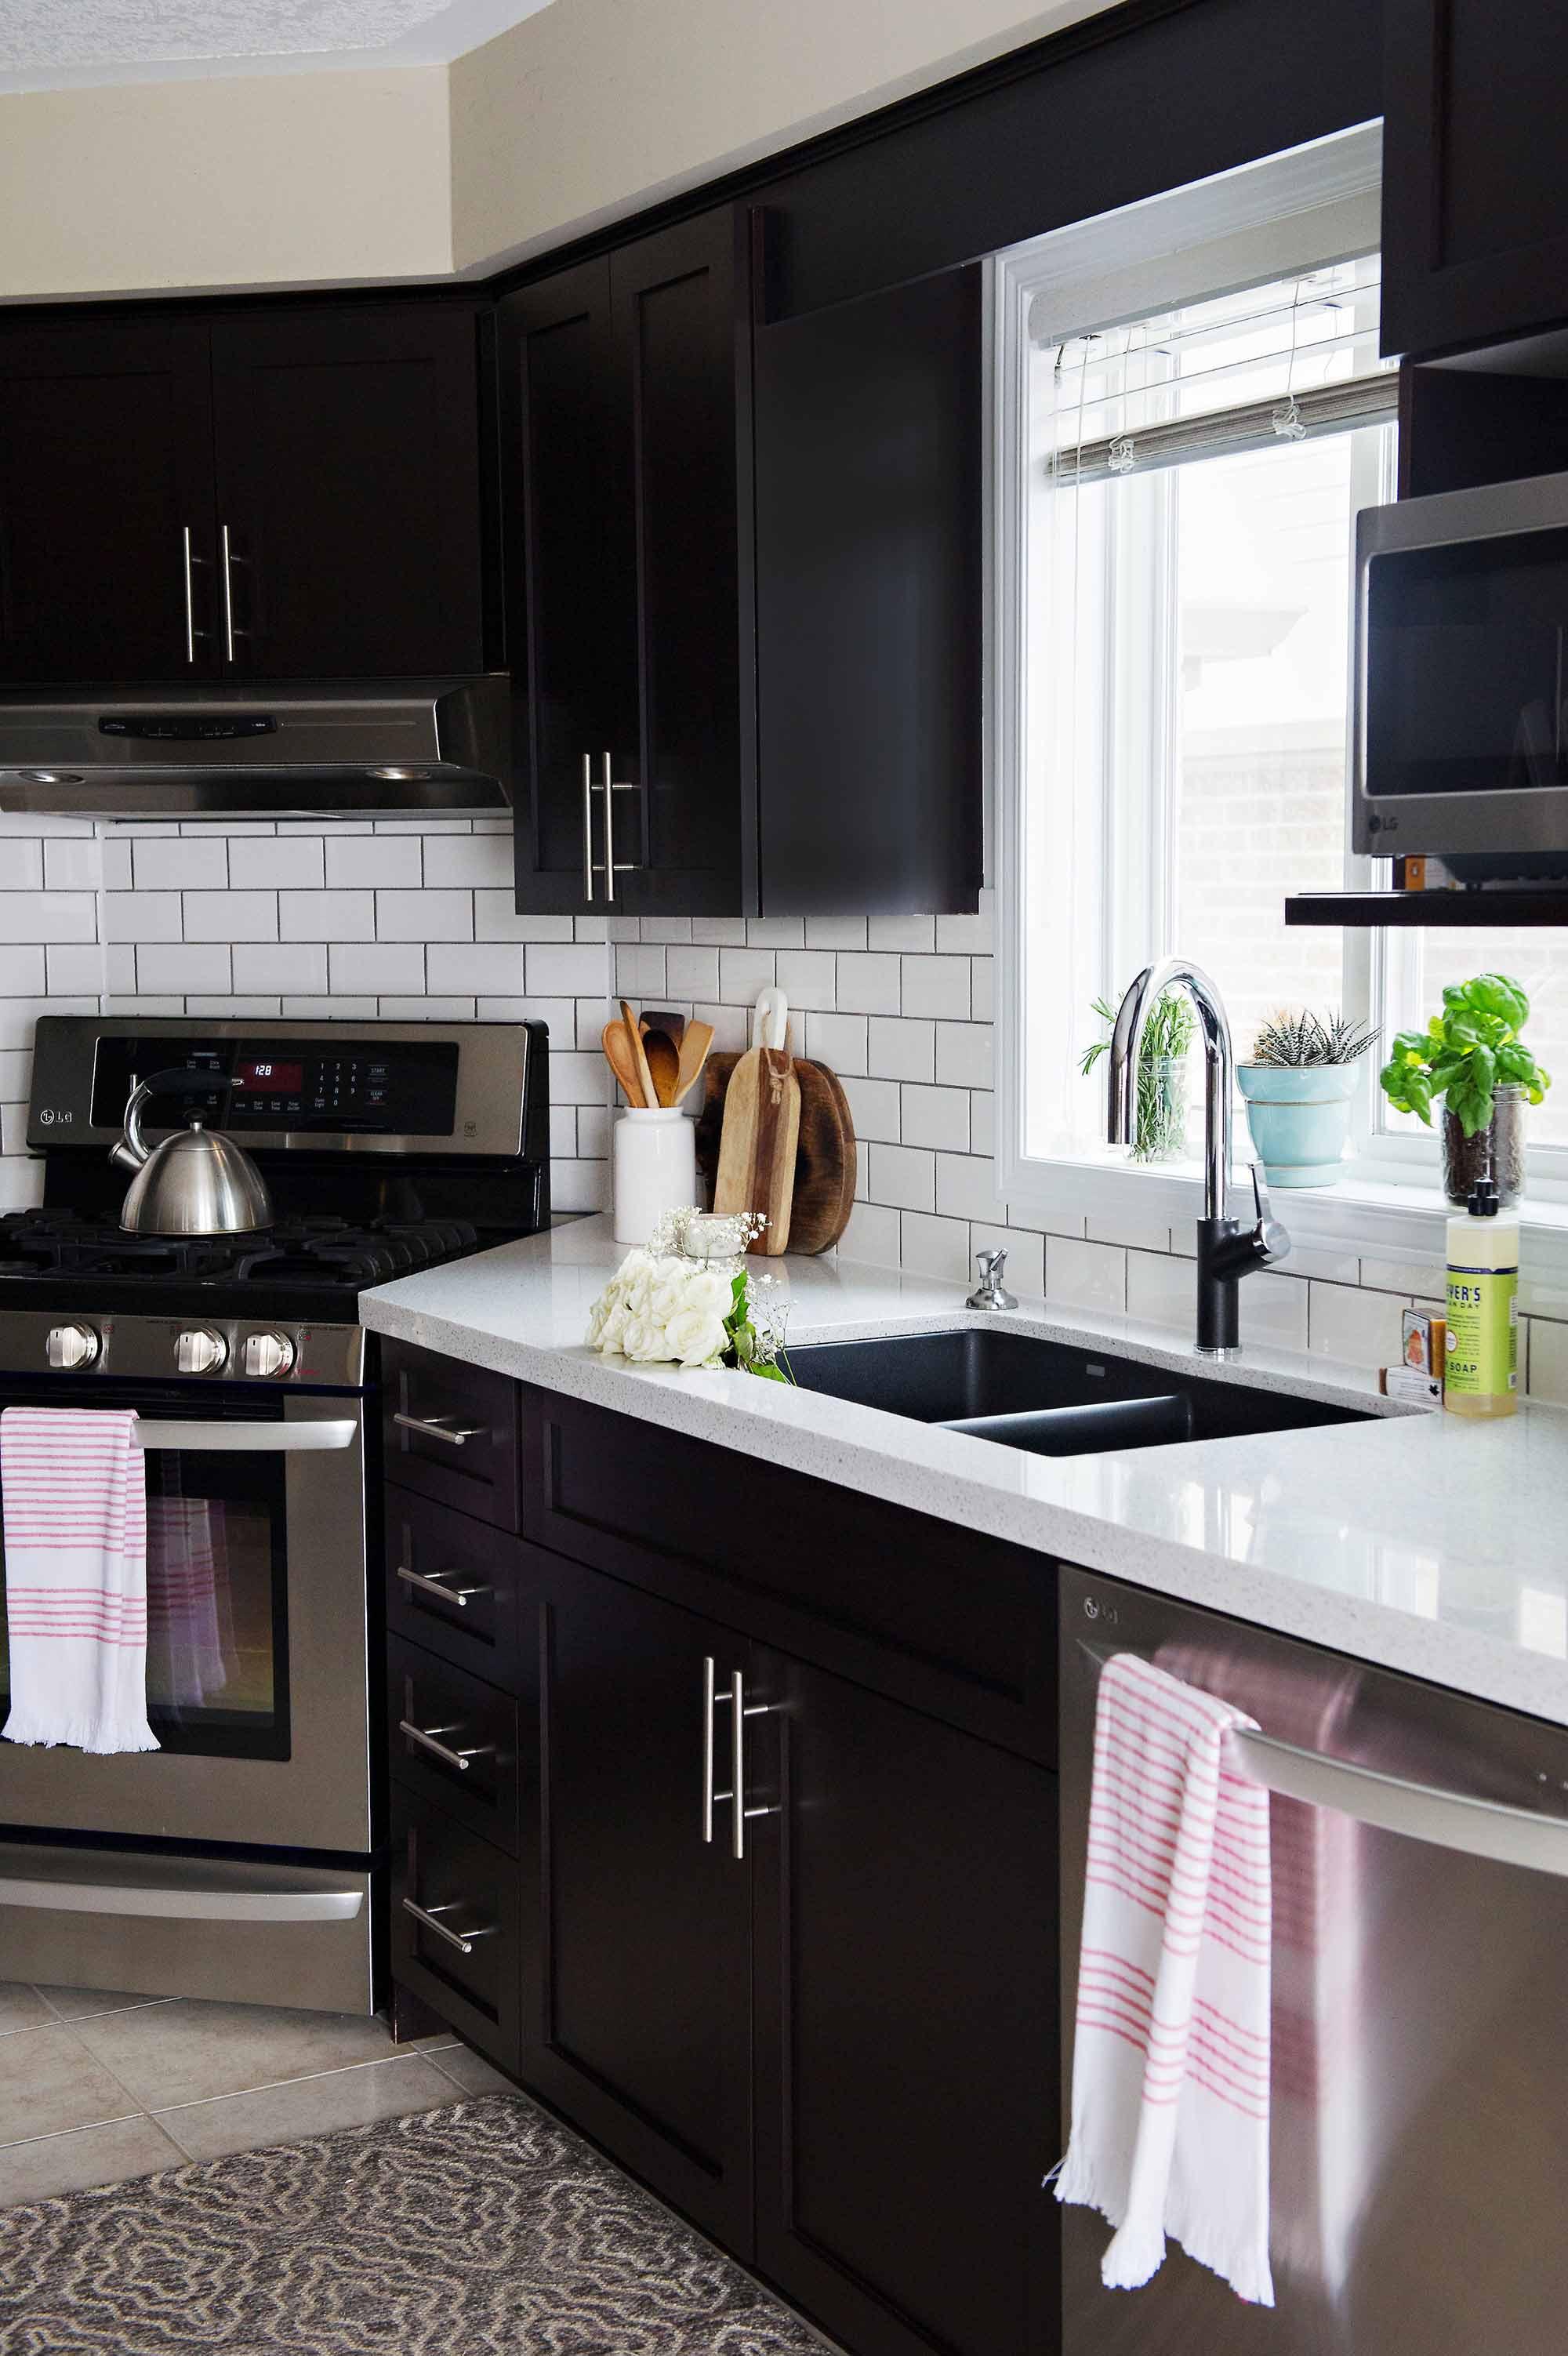 Home Depot Kitchen Backsplash at Home and Interior Design Ideas